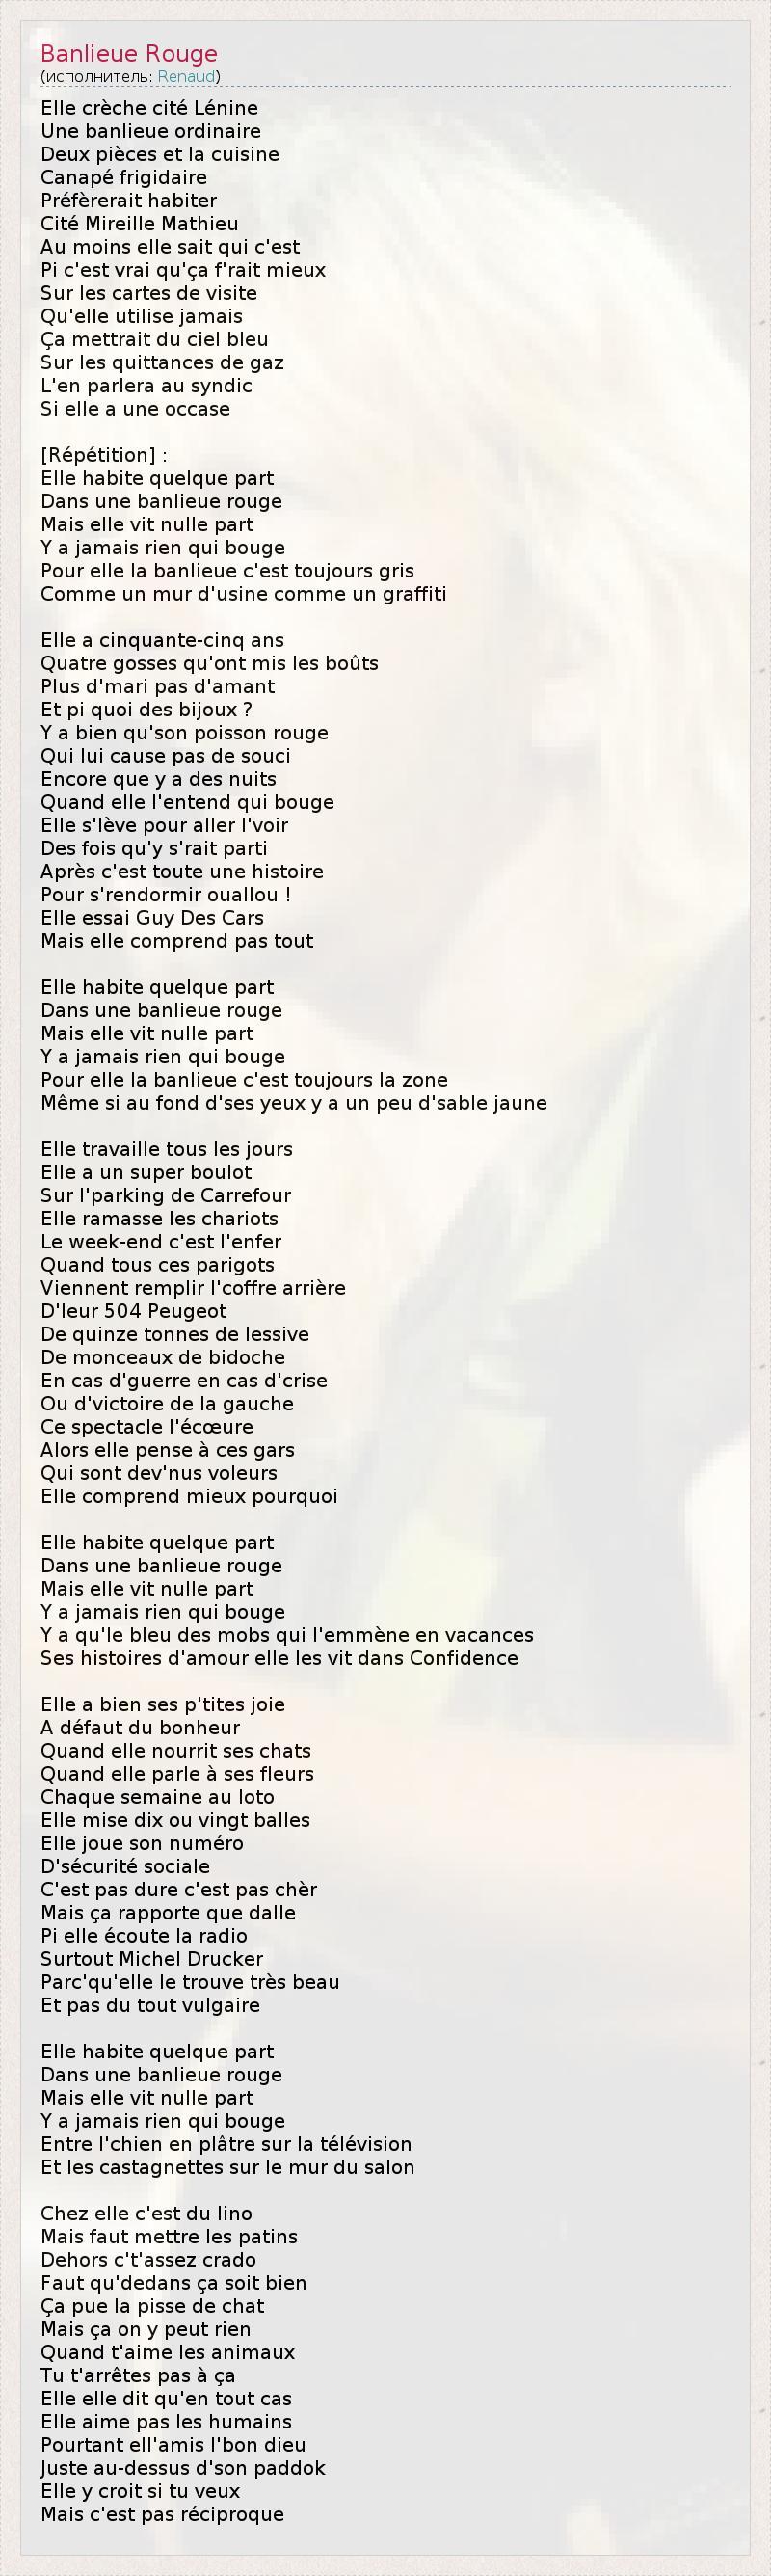 текст песни Banlieue Rouge слова песни